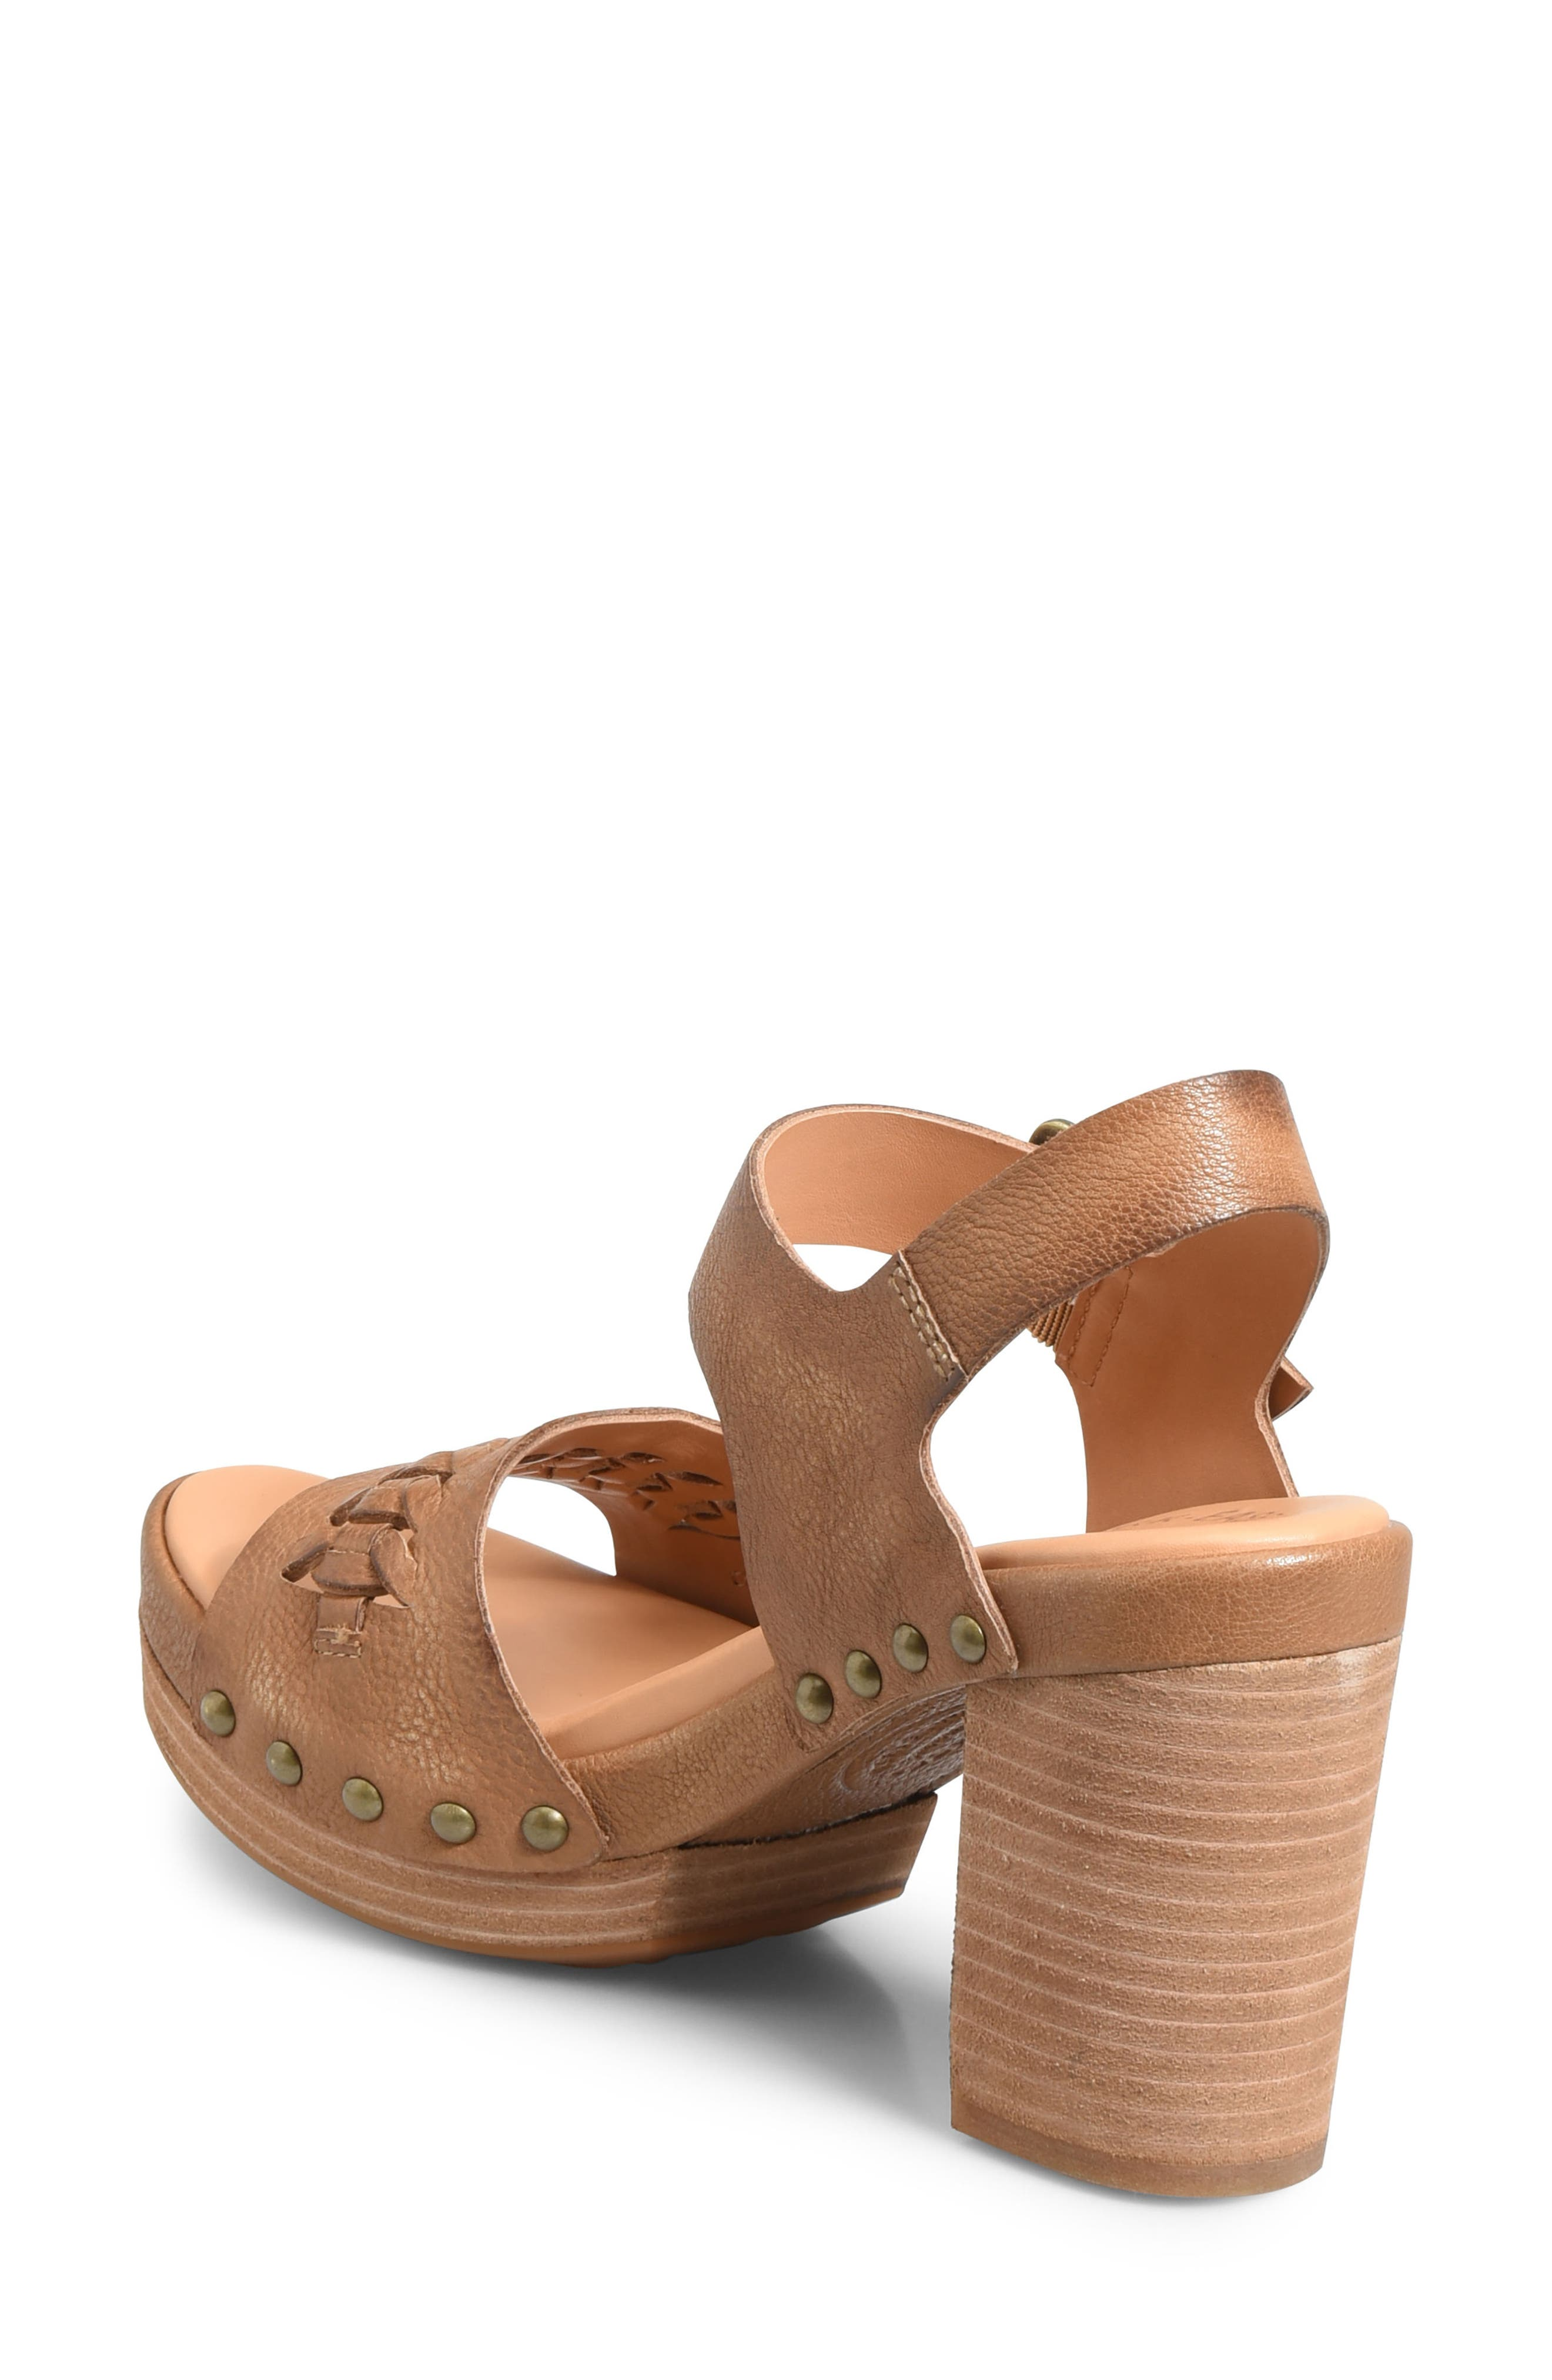 Pasilla Platform Sandal,                             Alternate thumbnail 2, color,                             Light Brown Leather